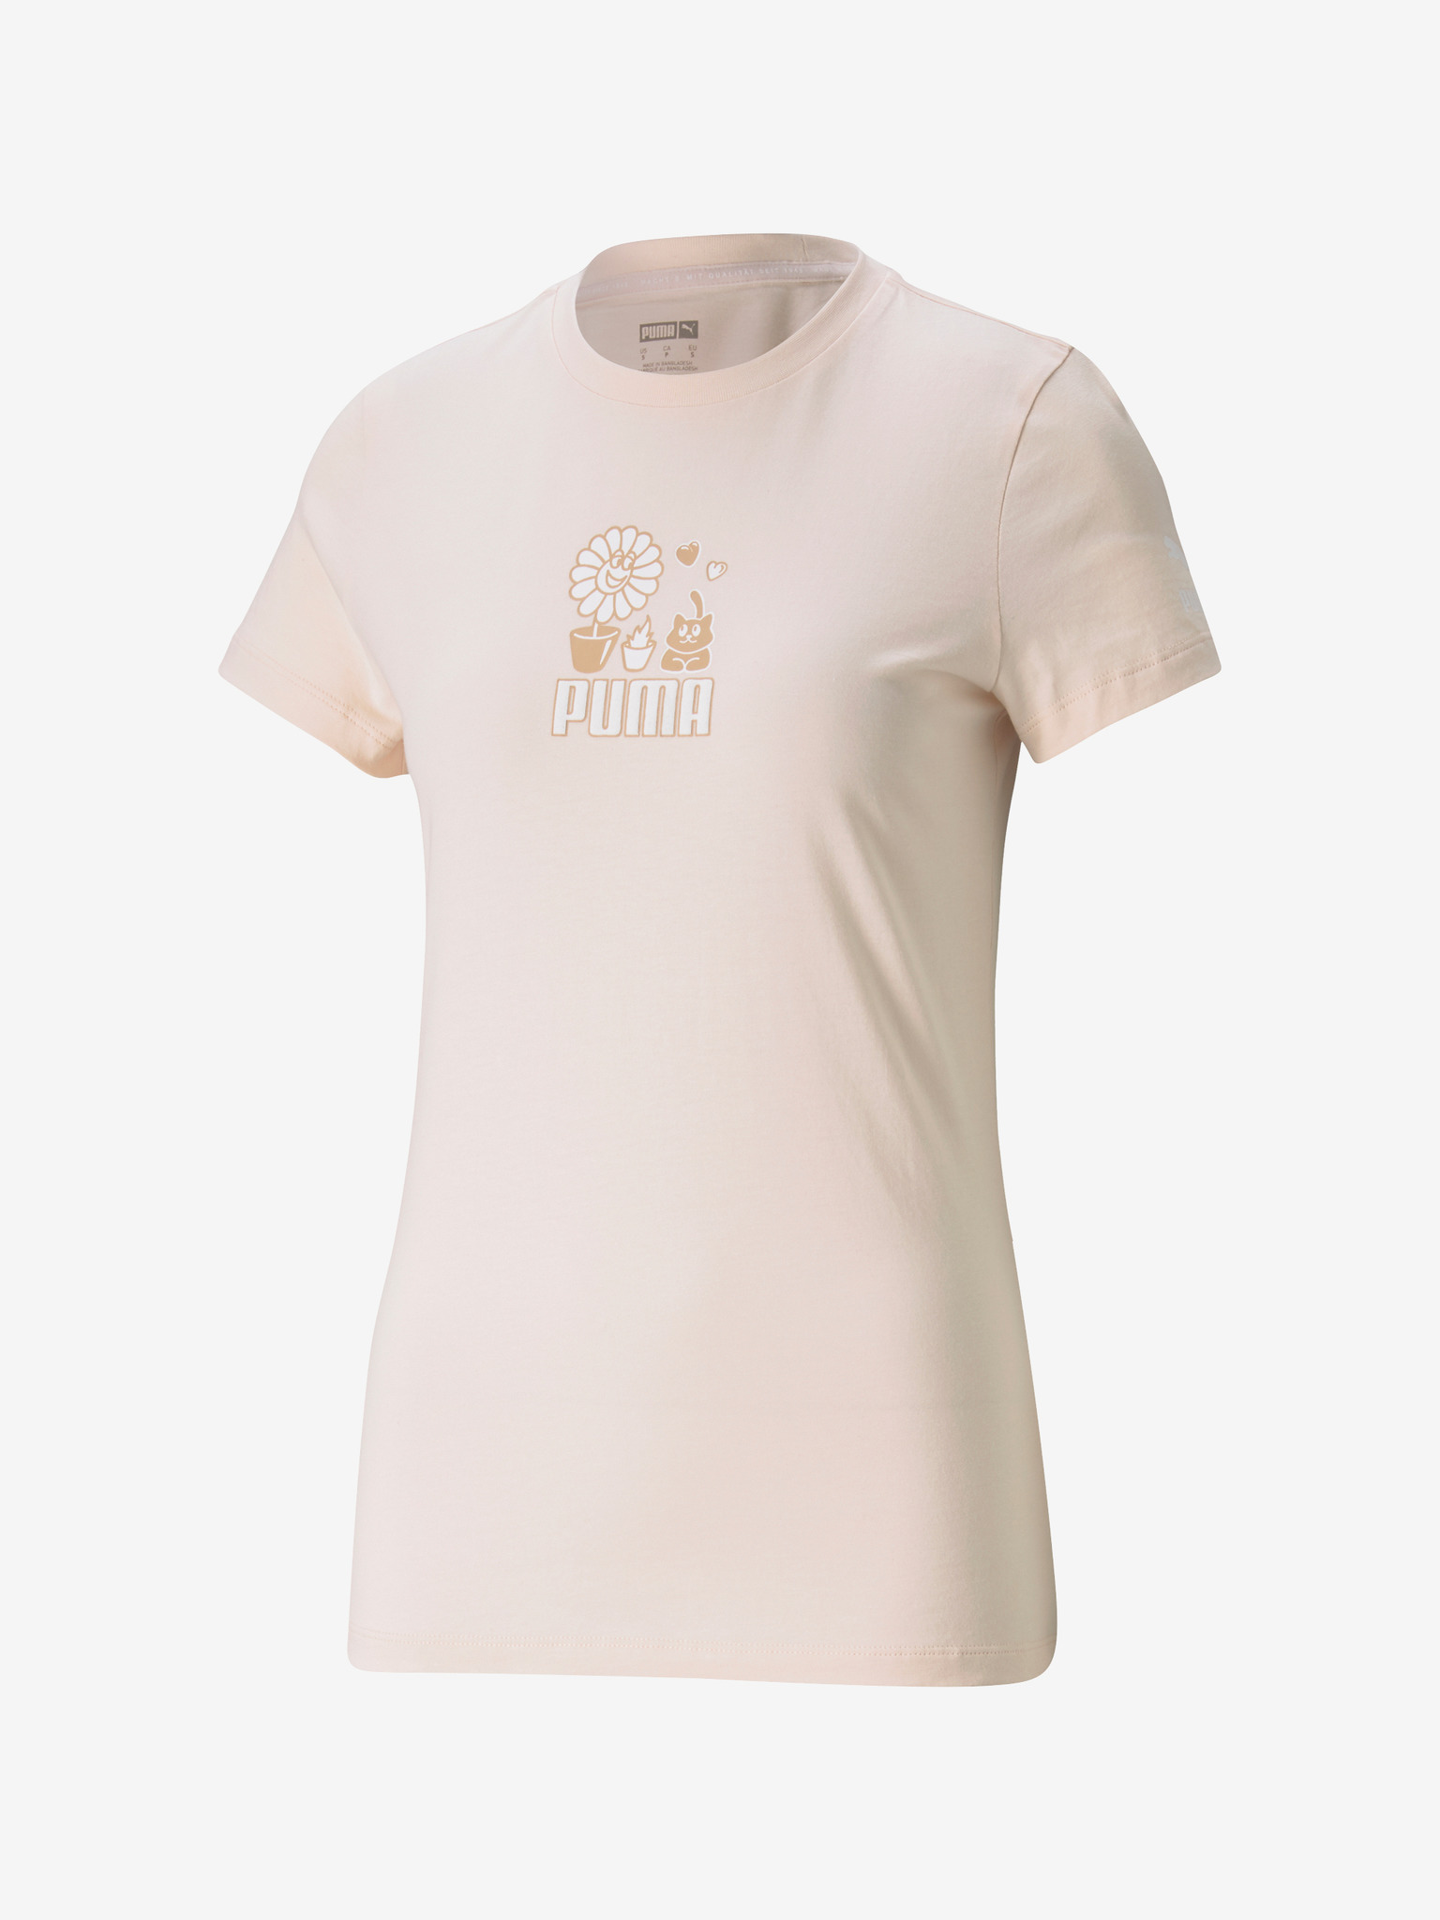 Puma Graphic Streetwear T-shirt Pink